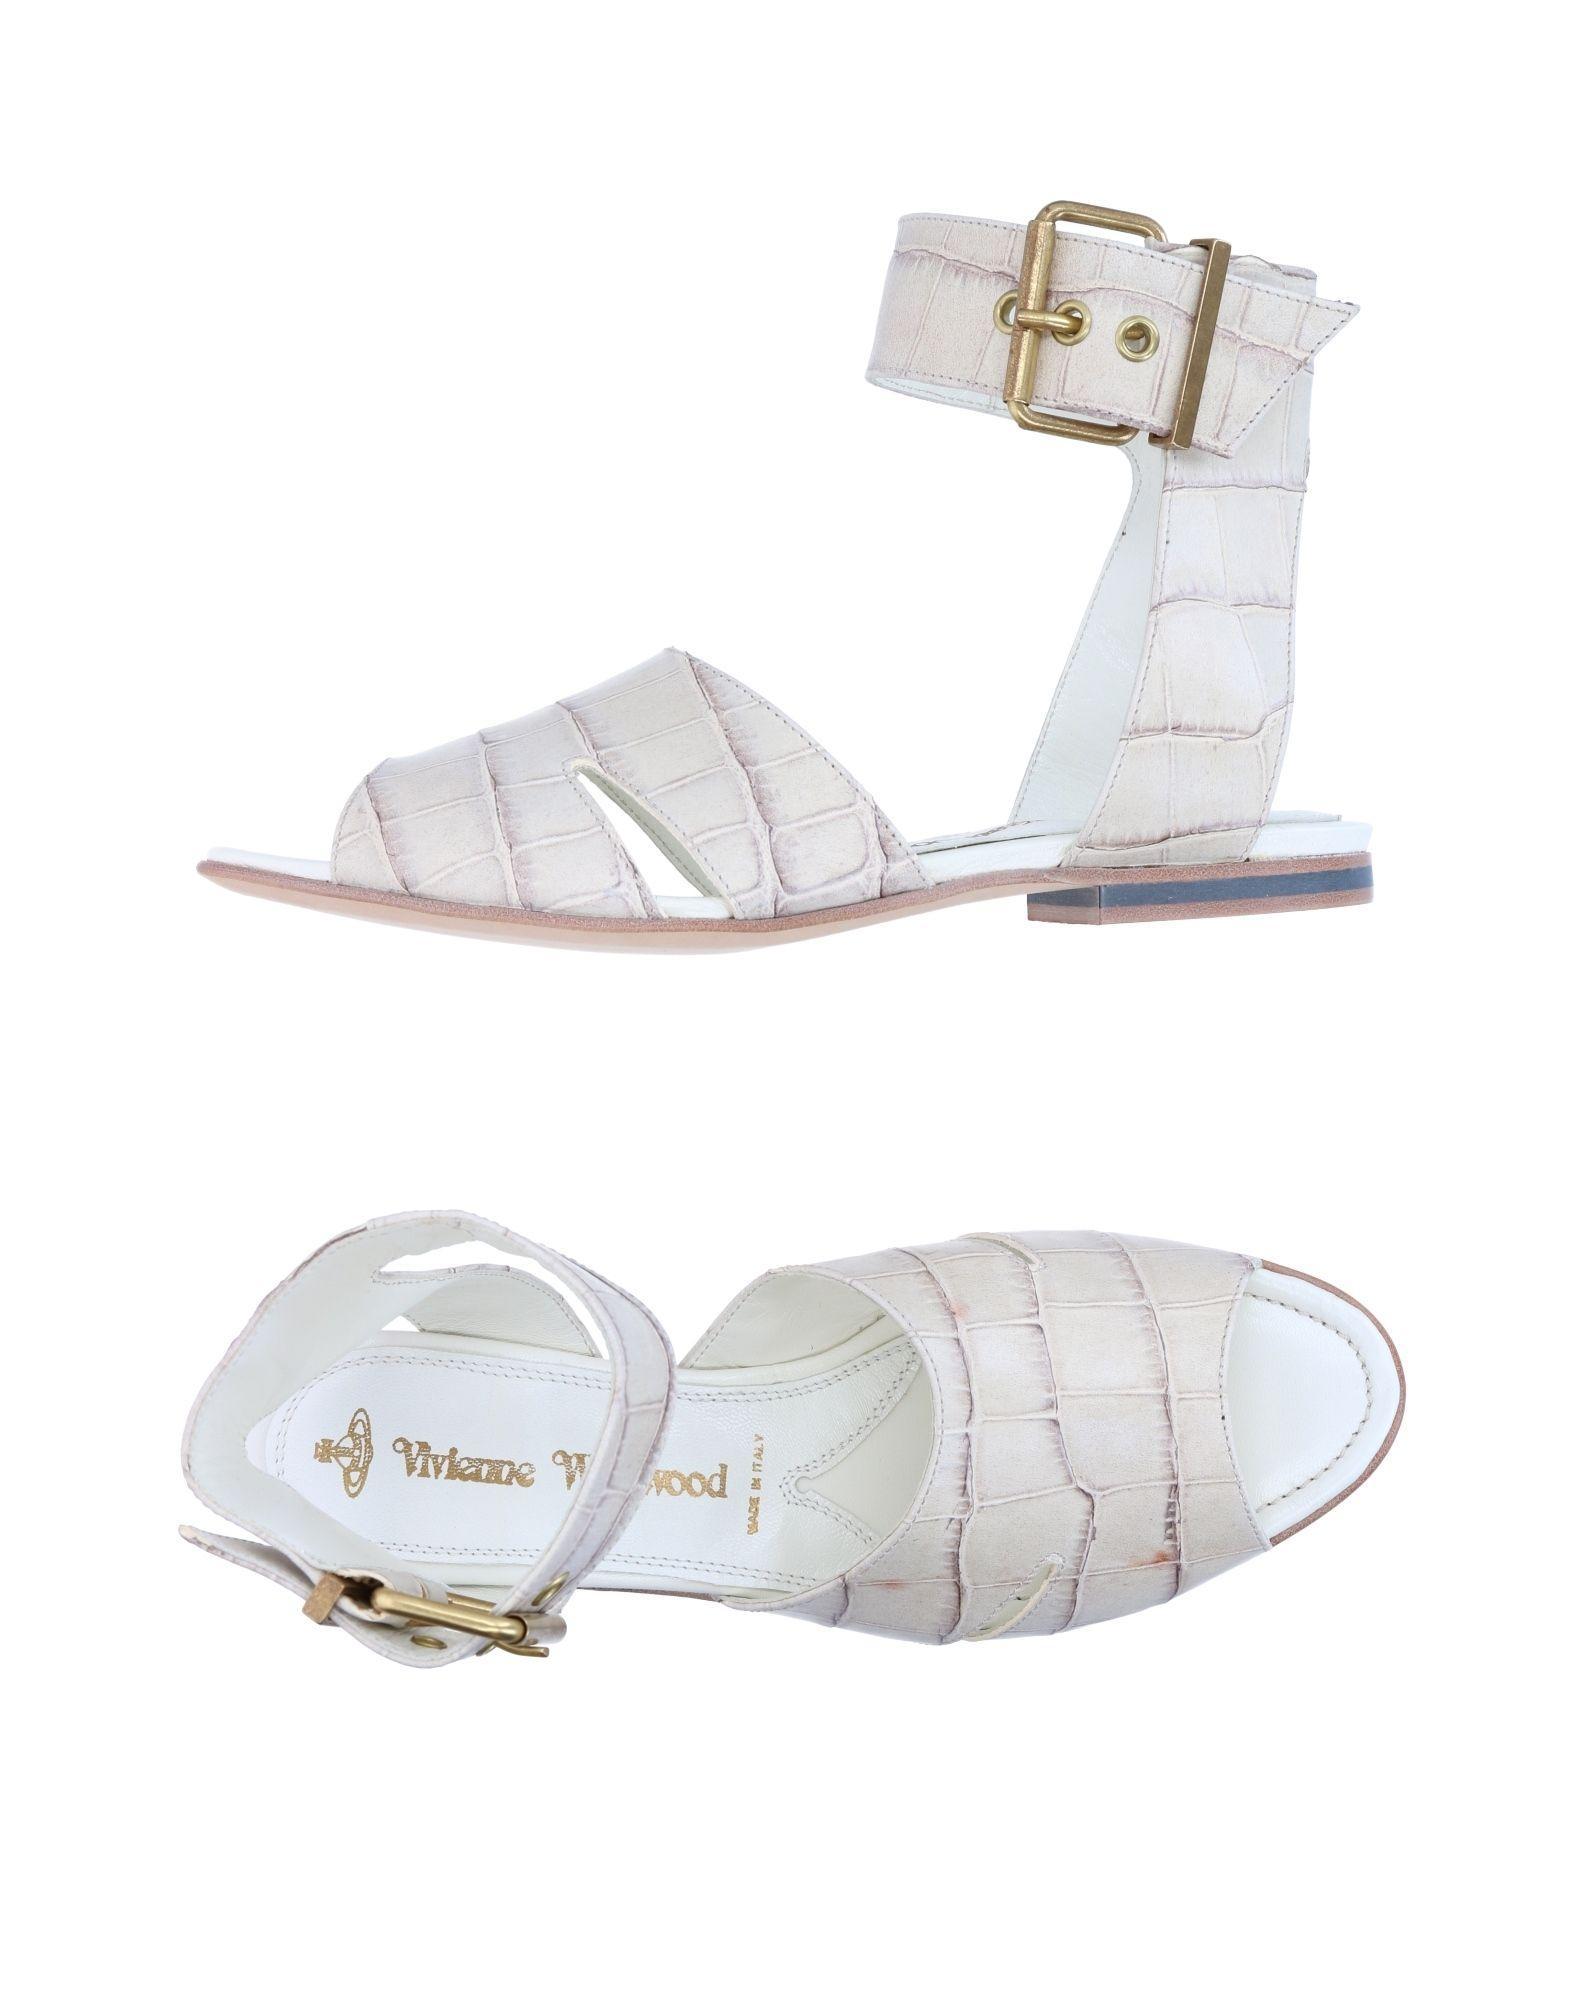 Vivienne Westwood Sandals In Beige